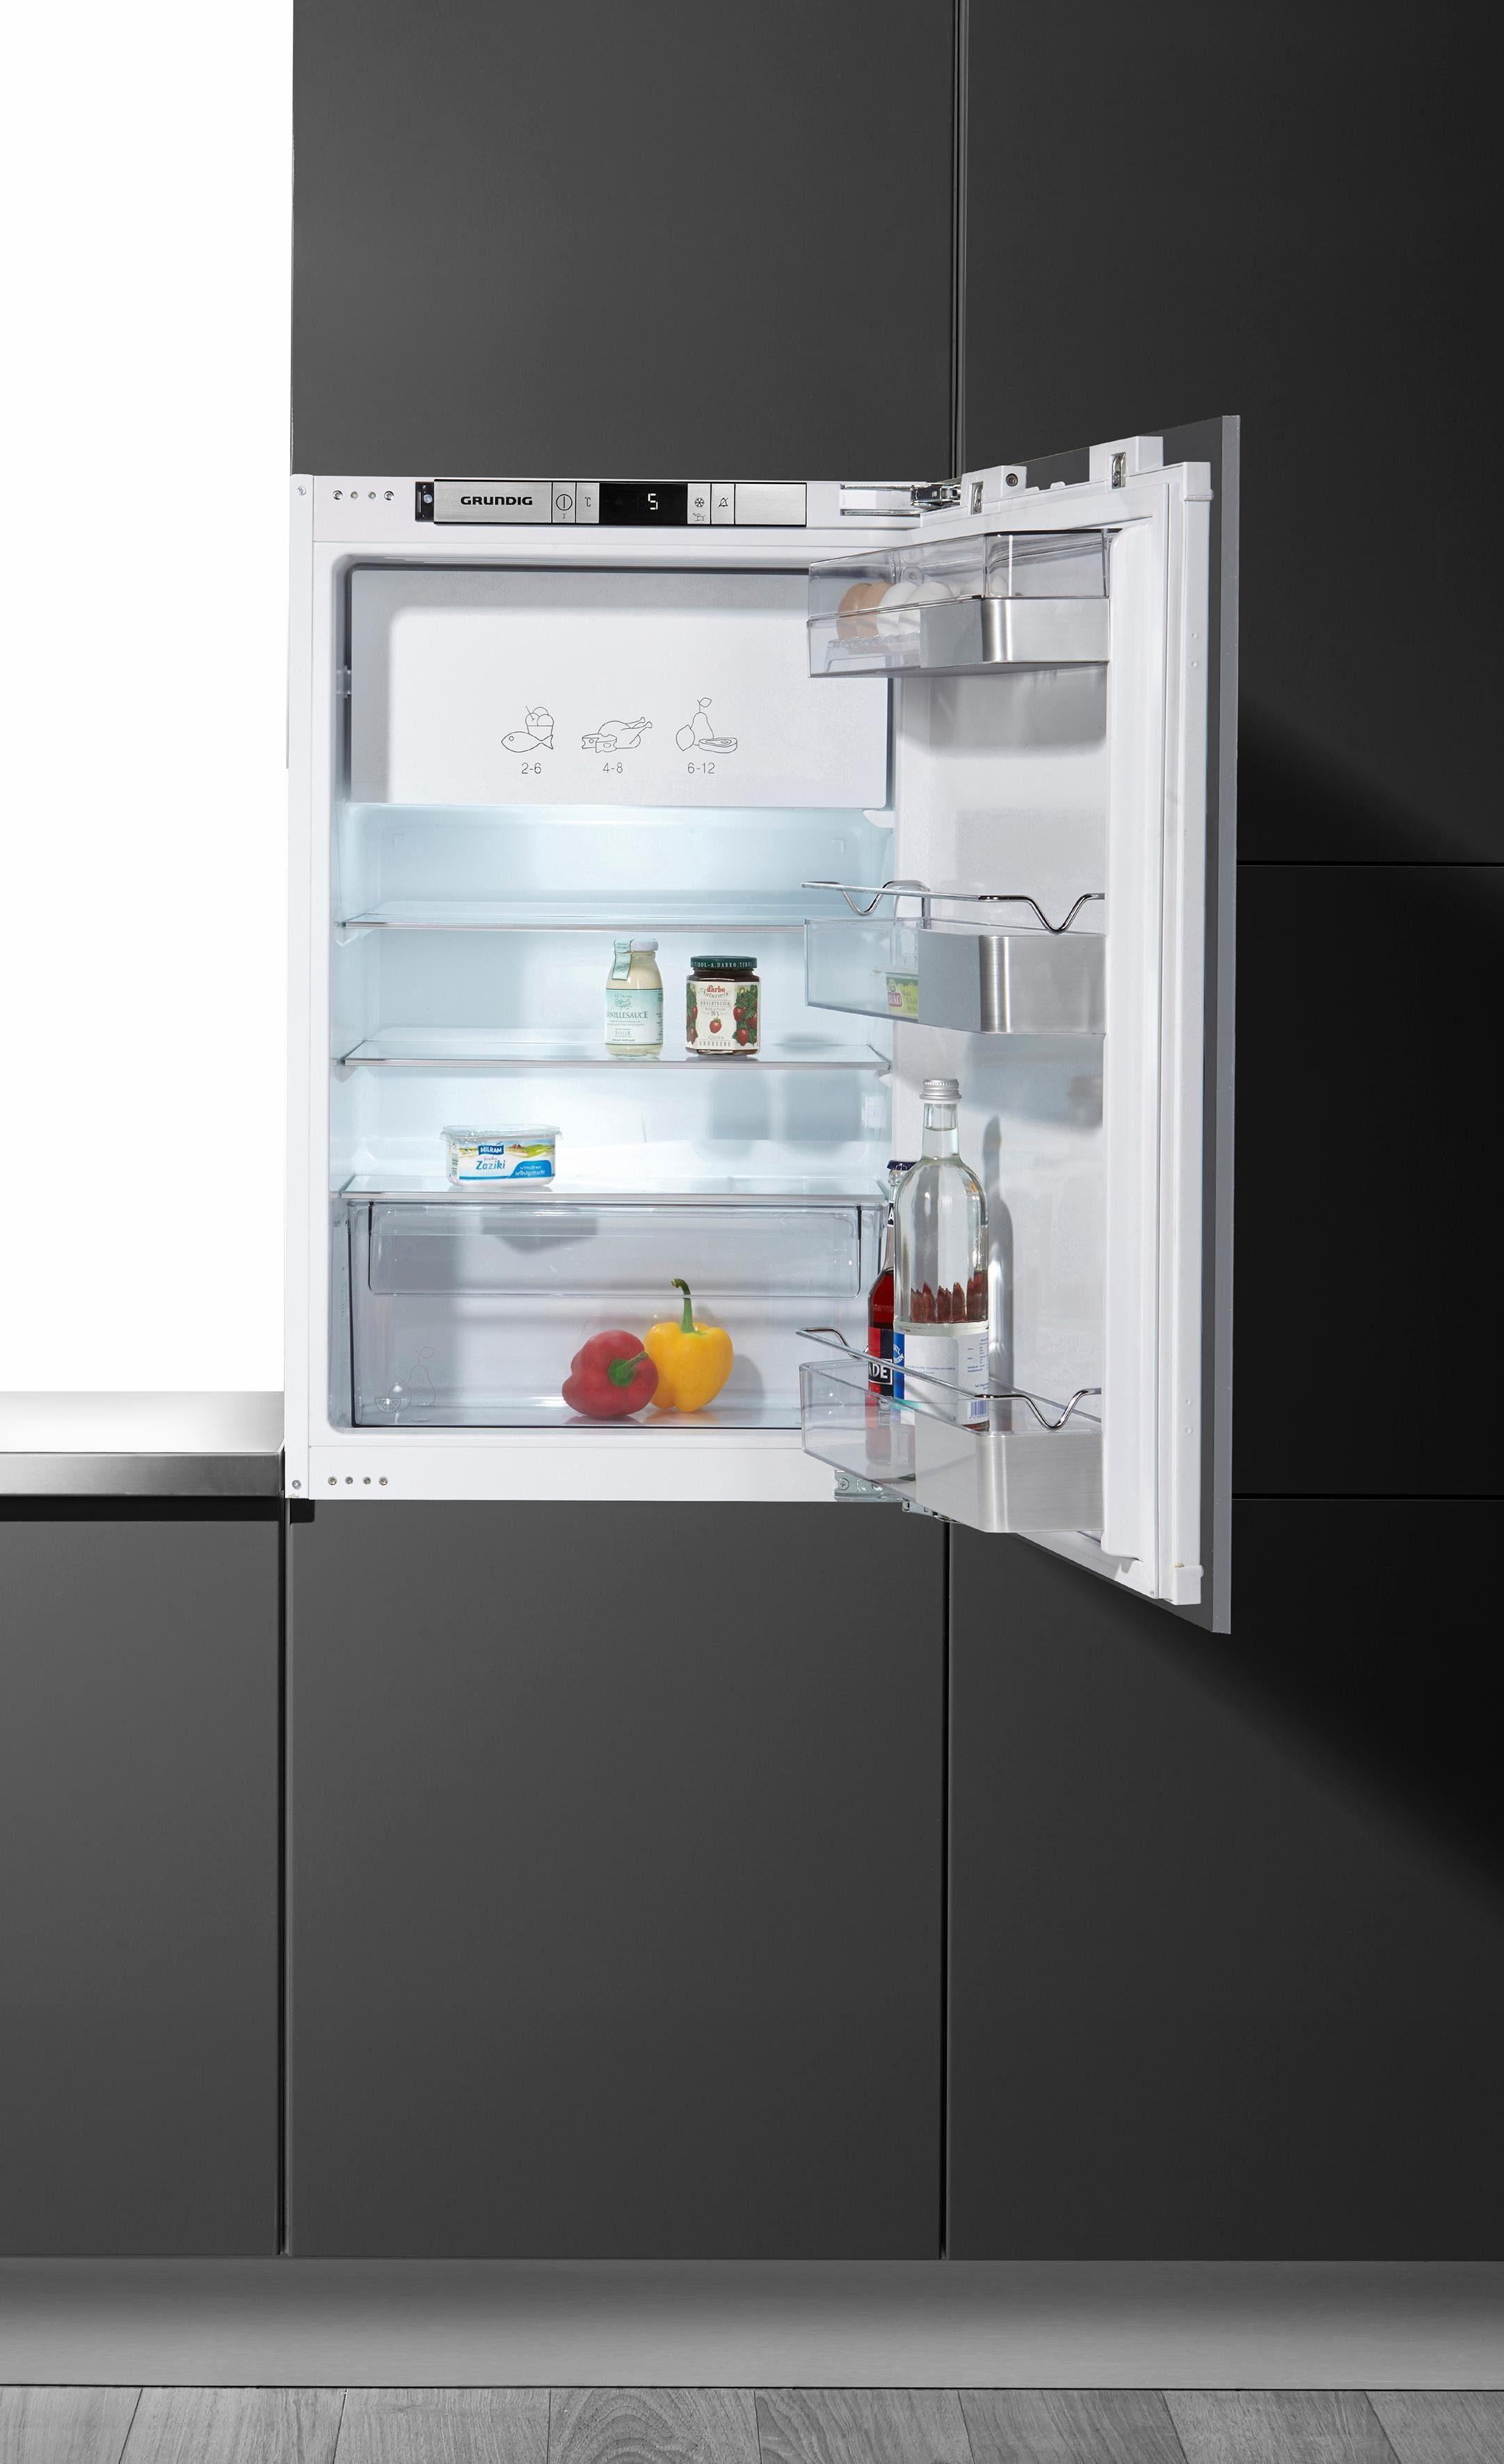 Grundig Einbaukühlschrank GTMI 14120, 87,7 cm hoch, 55,6 cm breit, A++, 87,7 cm, integrierbar